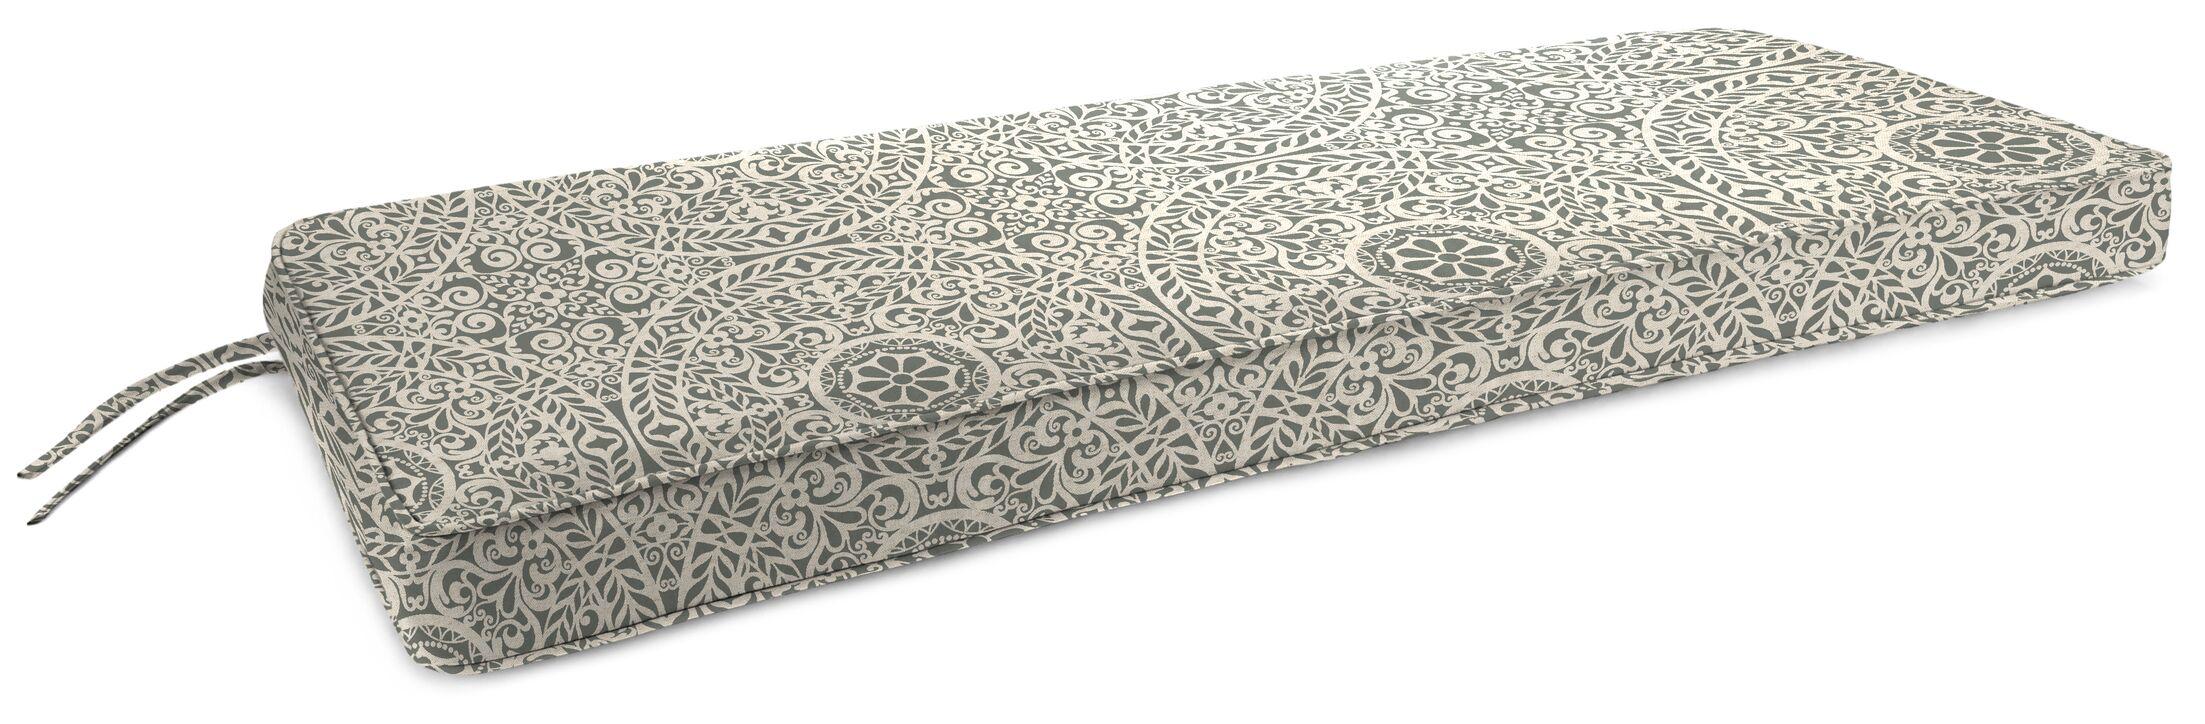 Indoor Bench Cushion Fabric: Tachenda Greystone